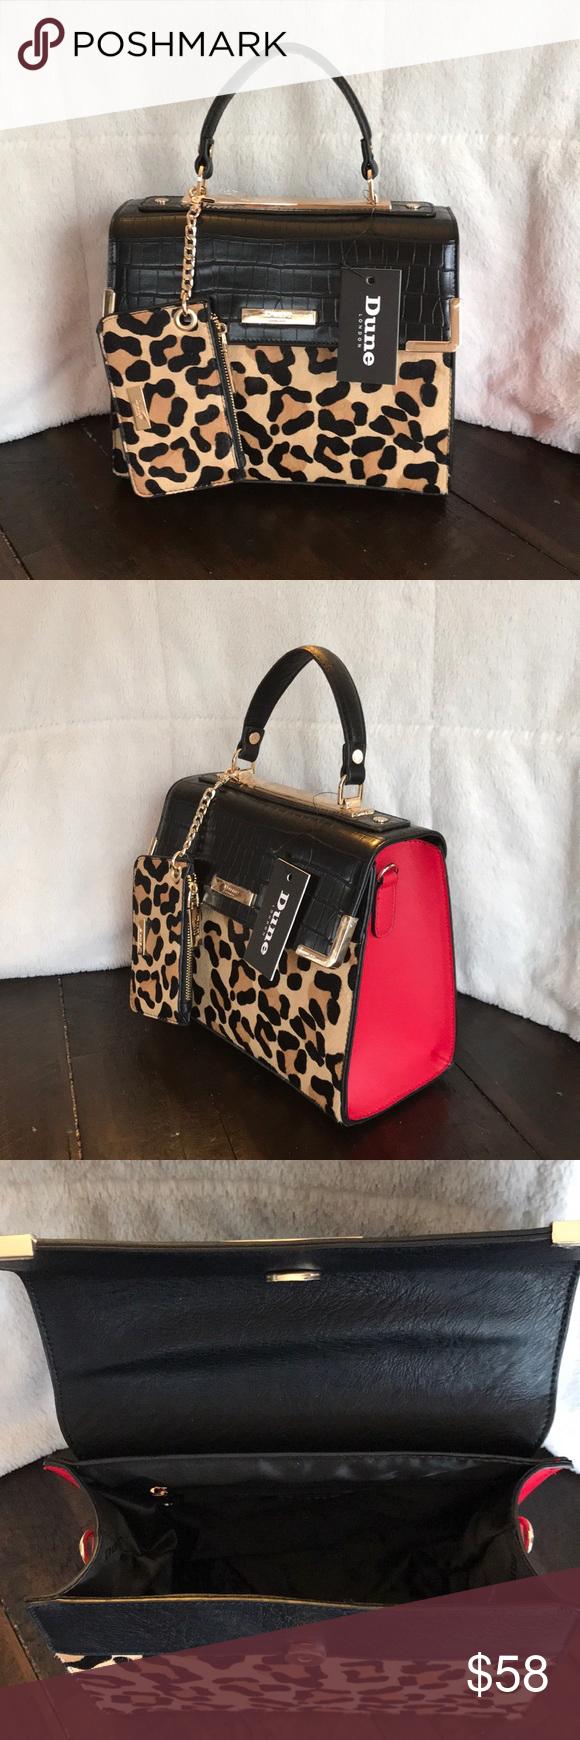 dd176e9bf40a9 Dune London faux leopard fur bag with red detail NWT DUNE LONDON Shoulder  Bag with faux leopard fur and red detail black strap for cross body wearing  Depth.